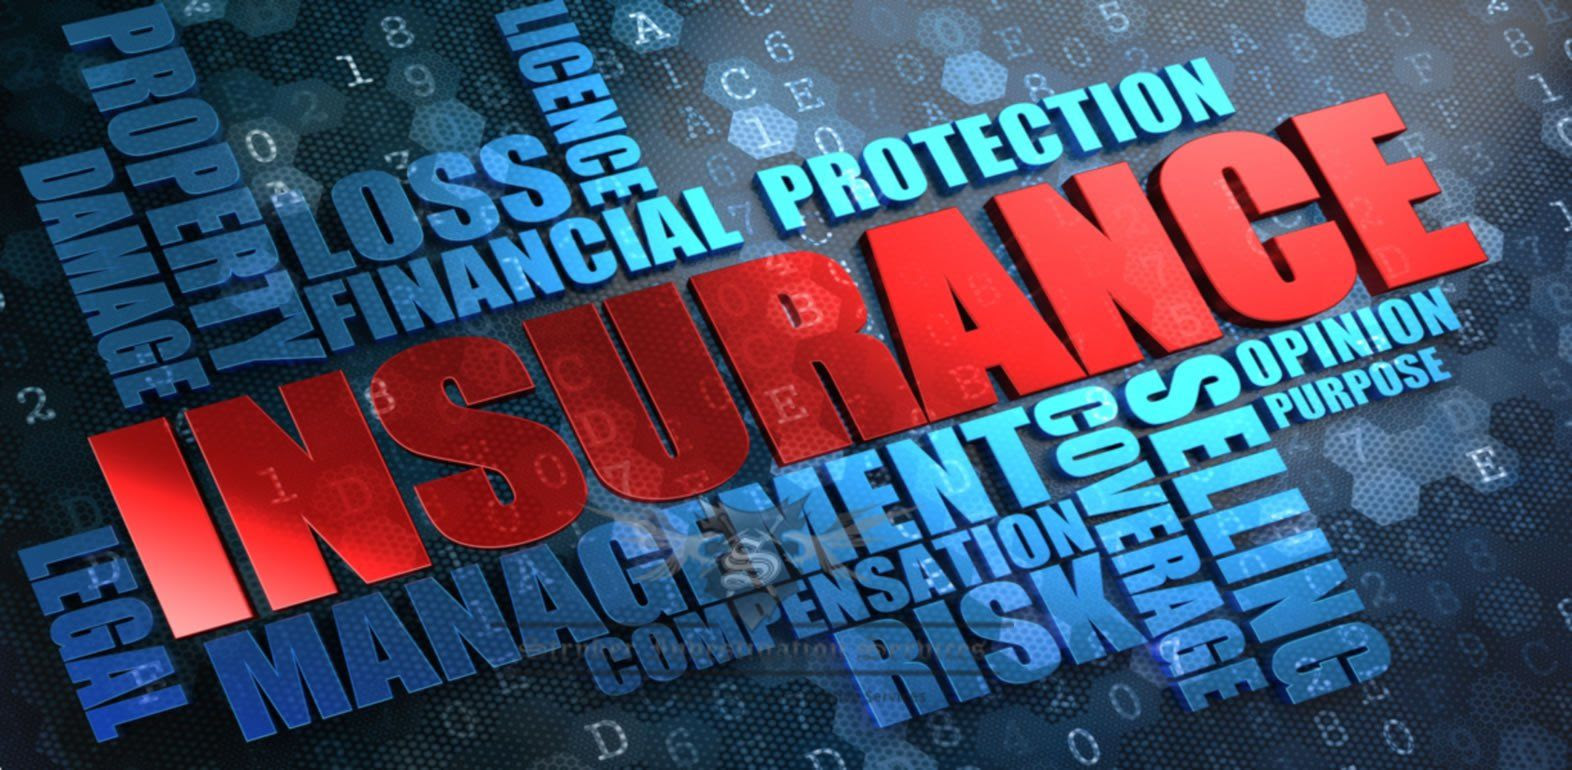 Private Investigator Errors and Omissions Insurance  LiabilityCover.ca